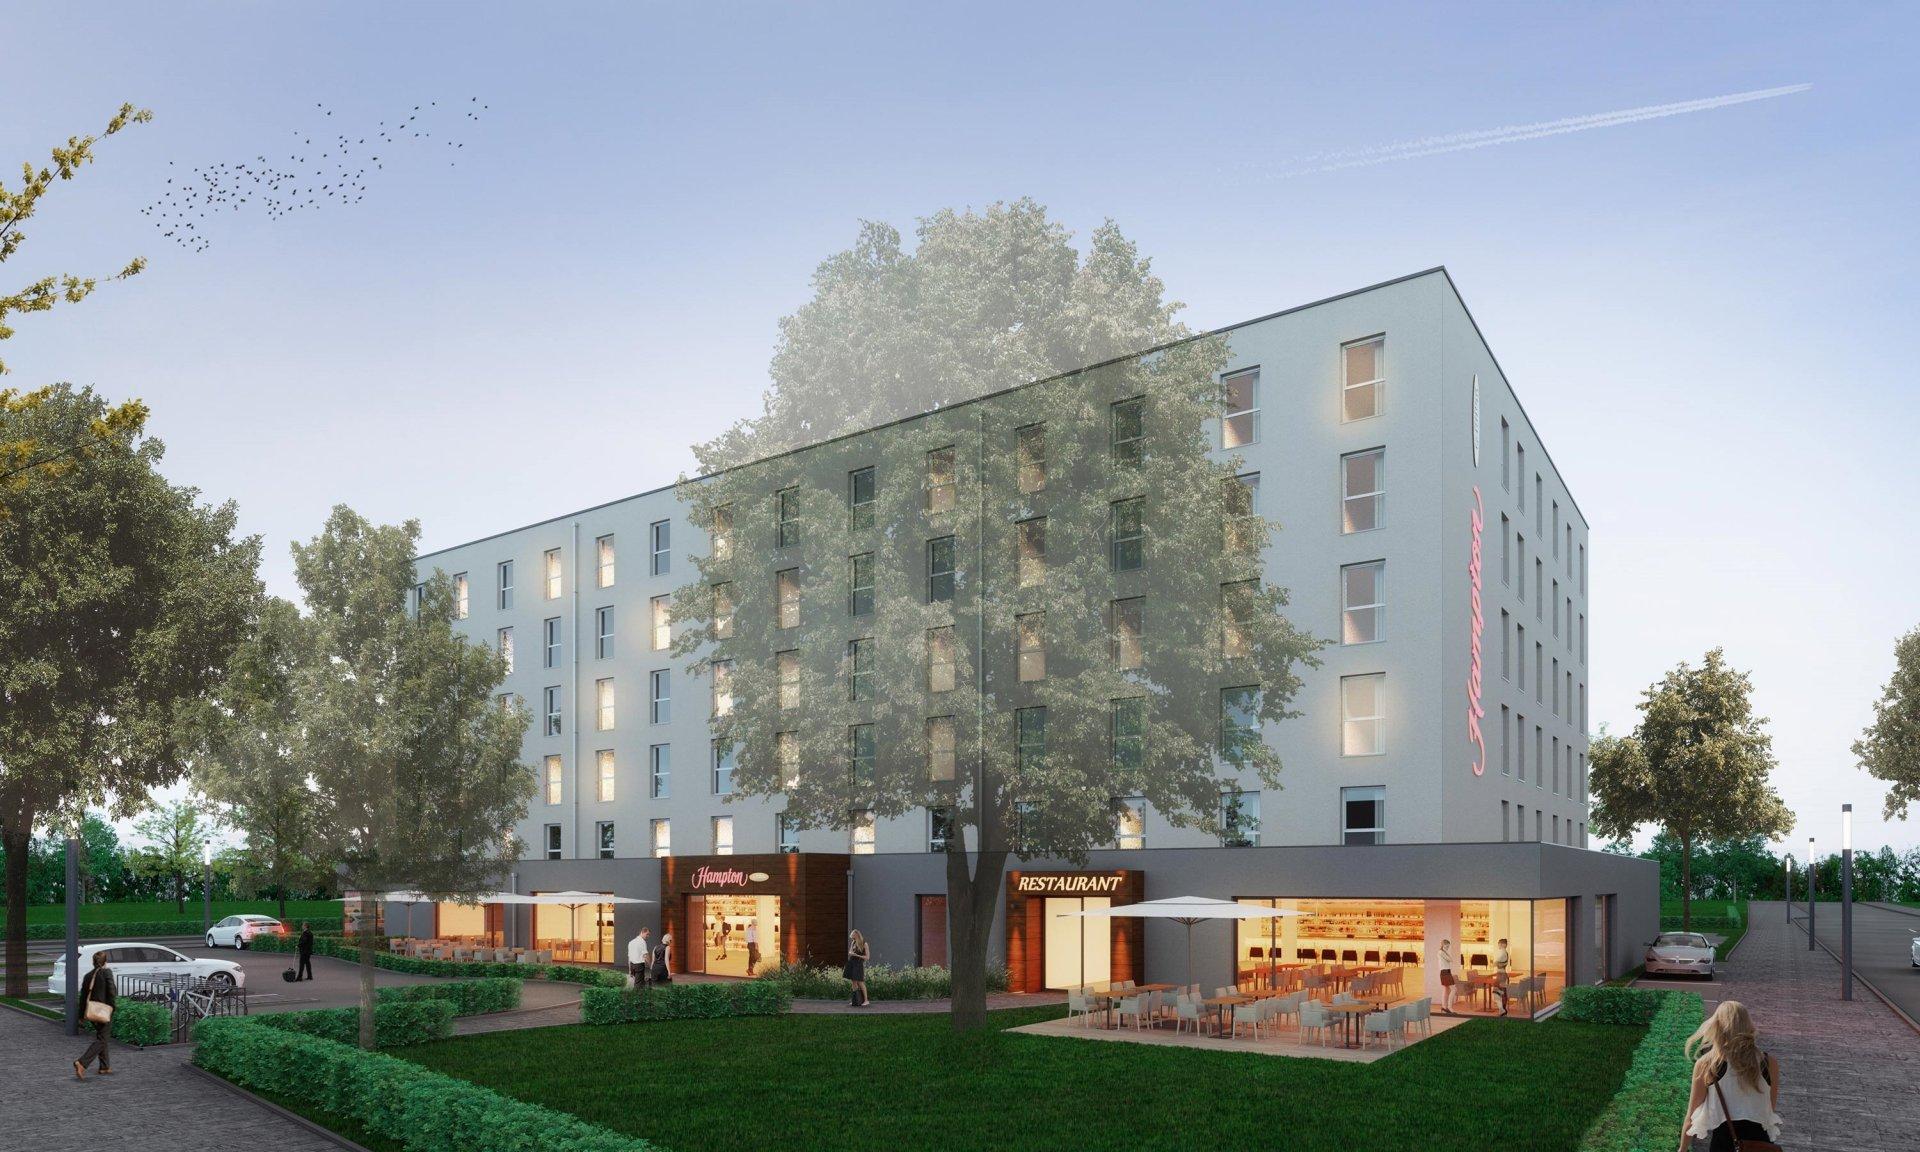 hampton by hilton kommt nach kaiserslautern hotelbau. Black Bedroom Furniture Sets. Home Design Ideas